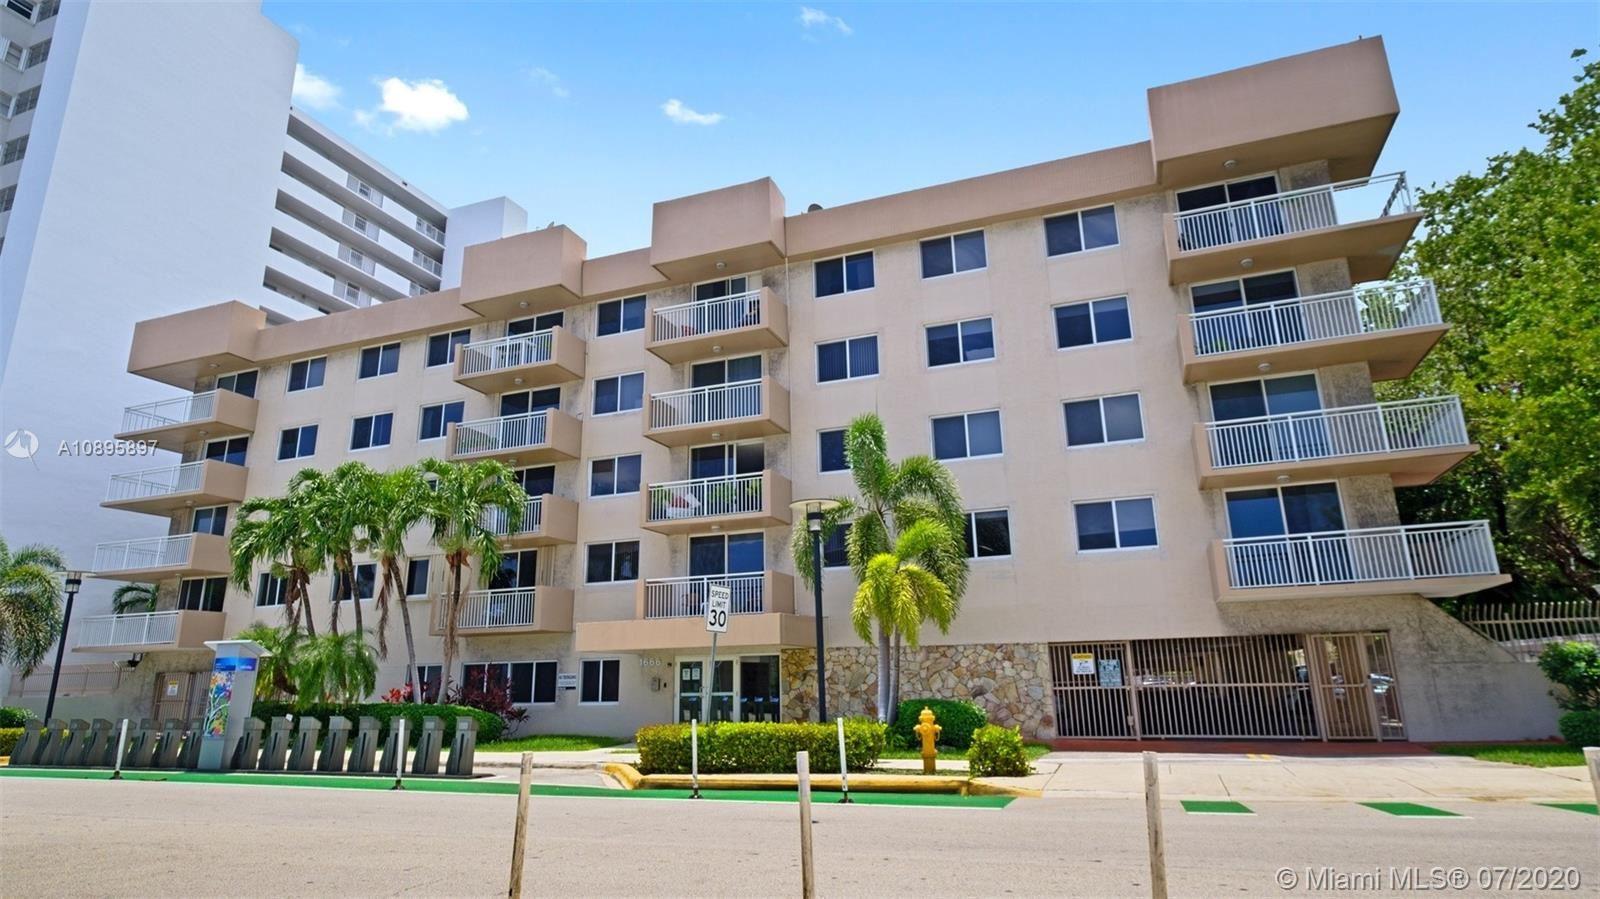 1666 West Ave #304, Miami Beach, FL 33139 - #: A10895897